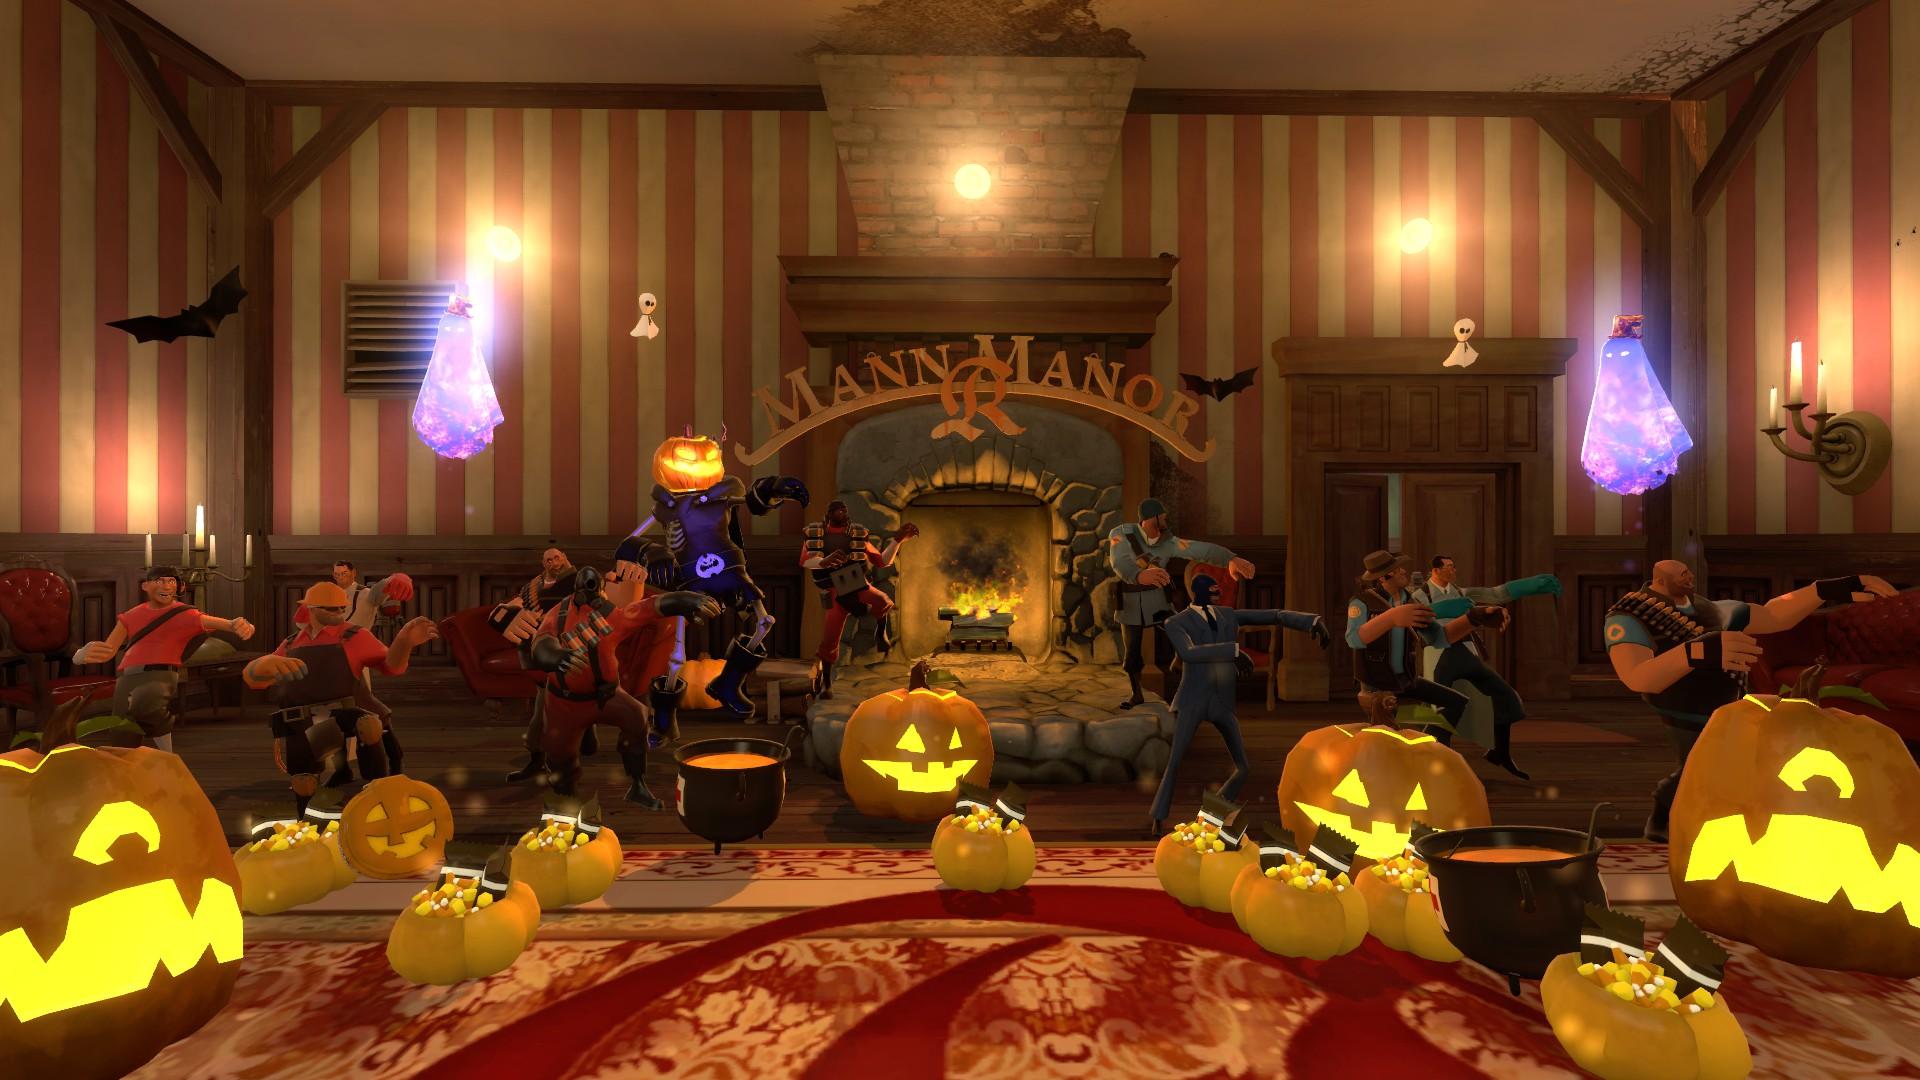 tf2 halloween wallpaper - photo #10